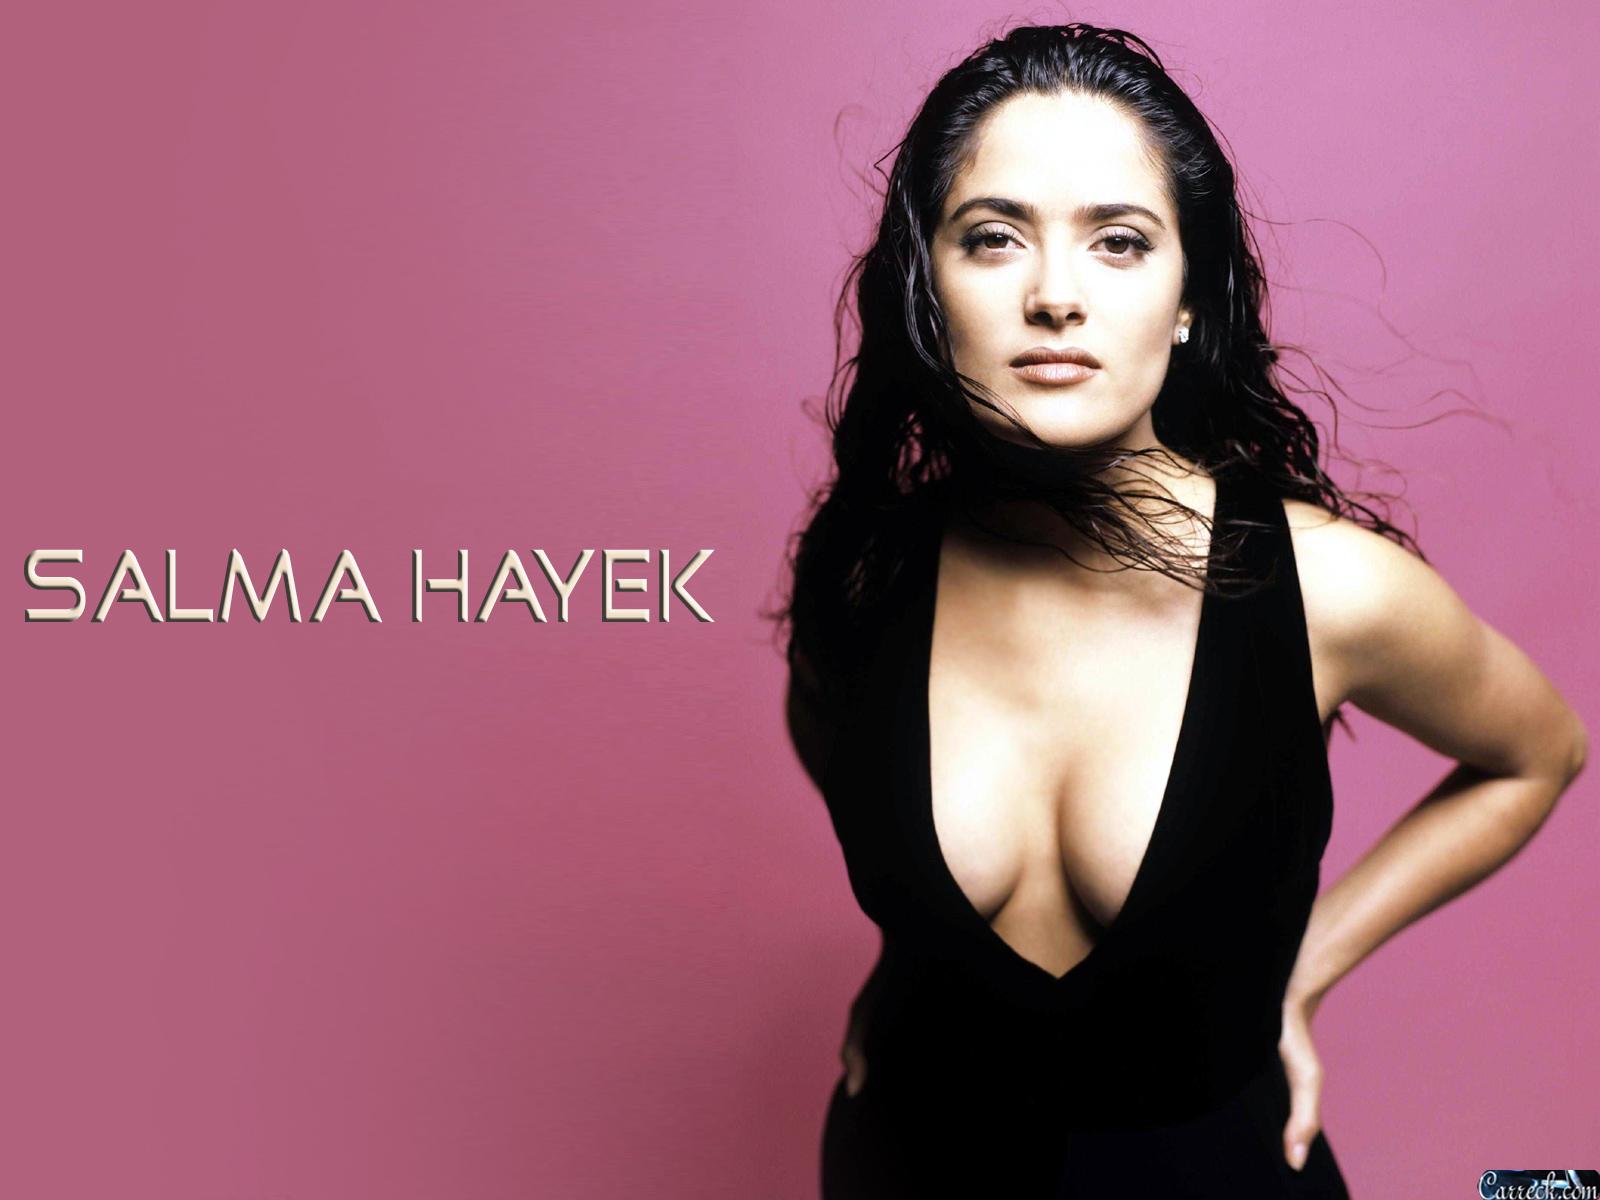 http://2.bp.blogspot.com/-HDiYf_pIYoc/T6BhZmbLfnI/AAAAAAAACdw/xpB9wCDgxz4/s1600/Salma+Hayek+wallpapers+5.jpg